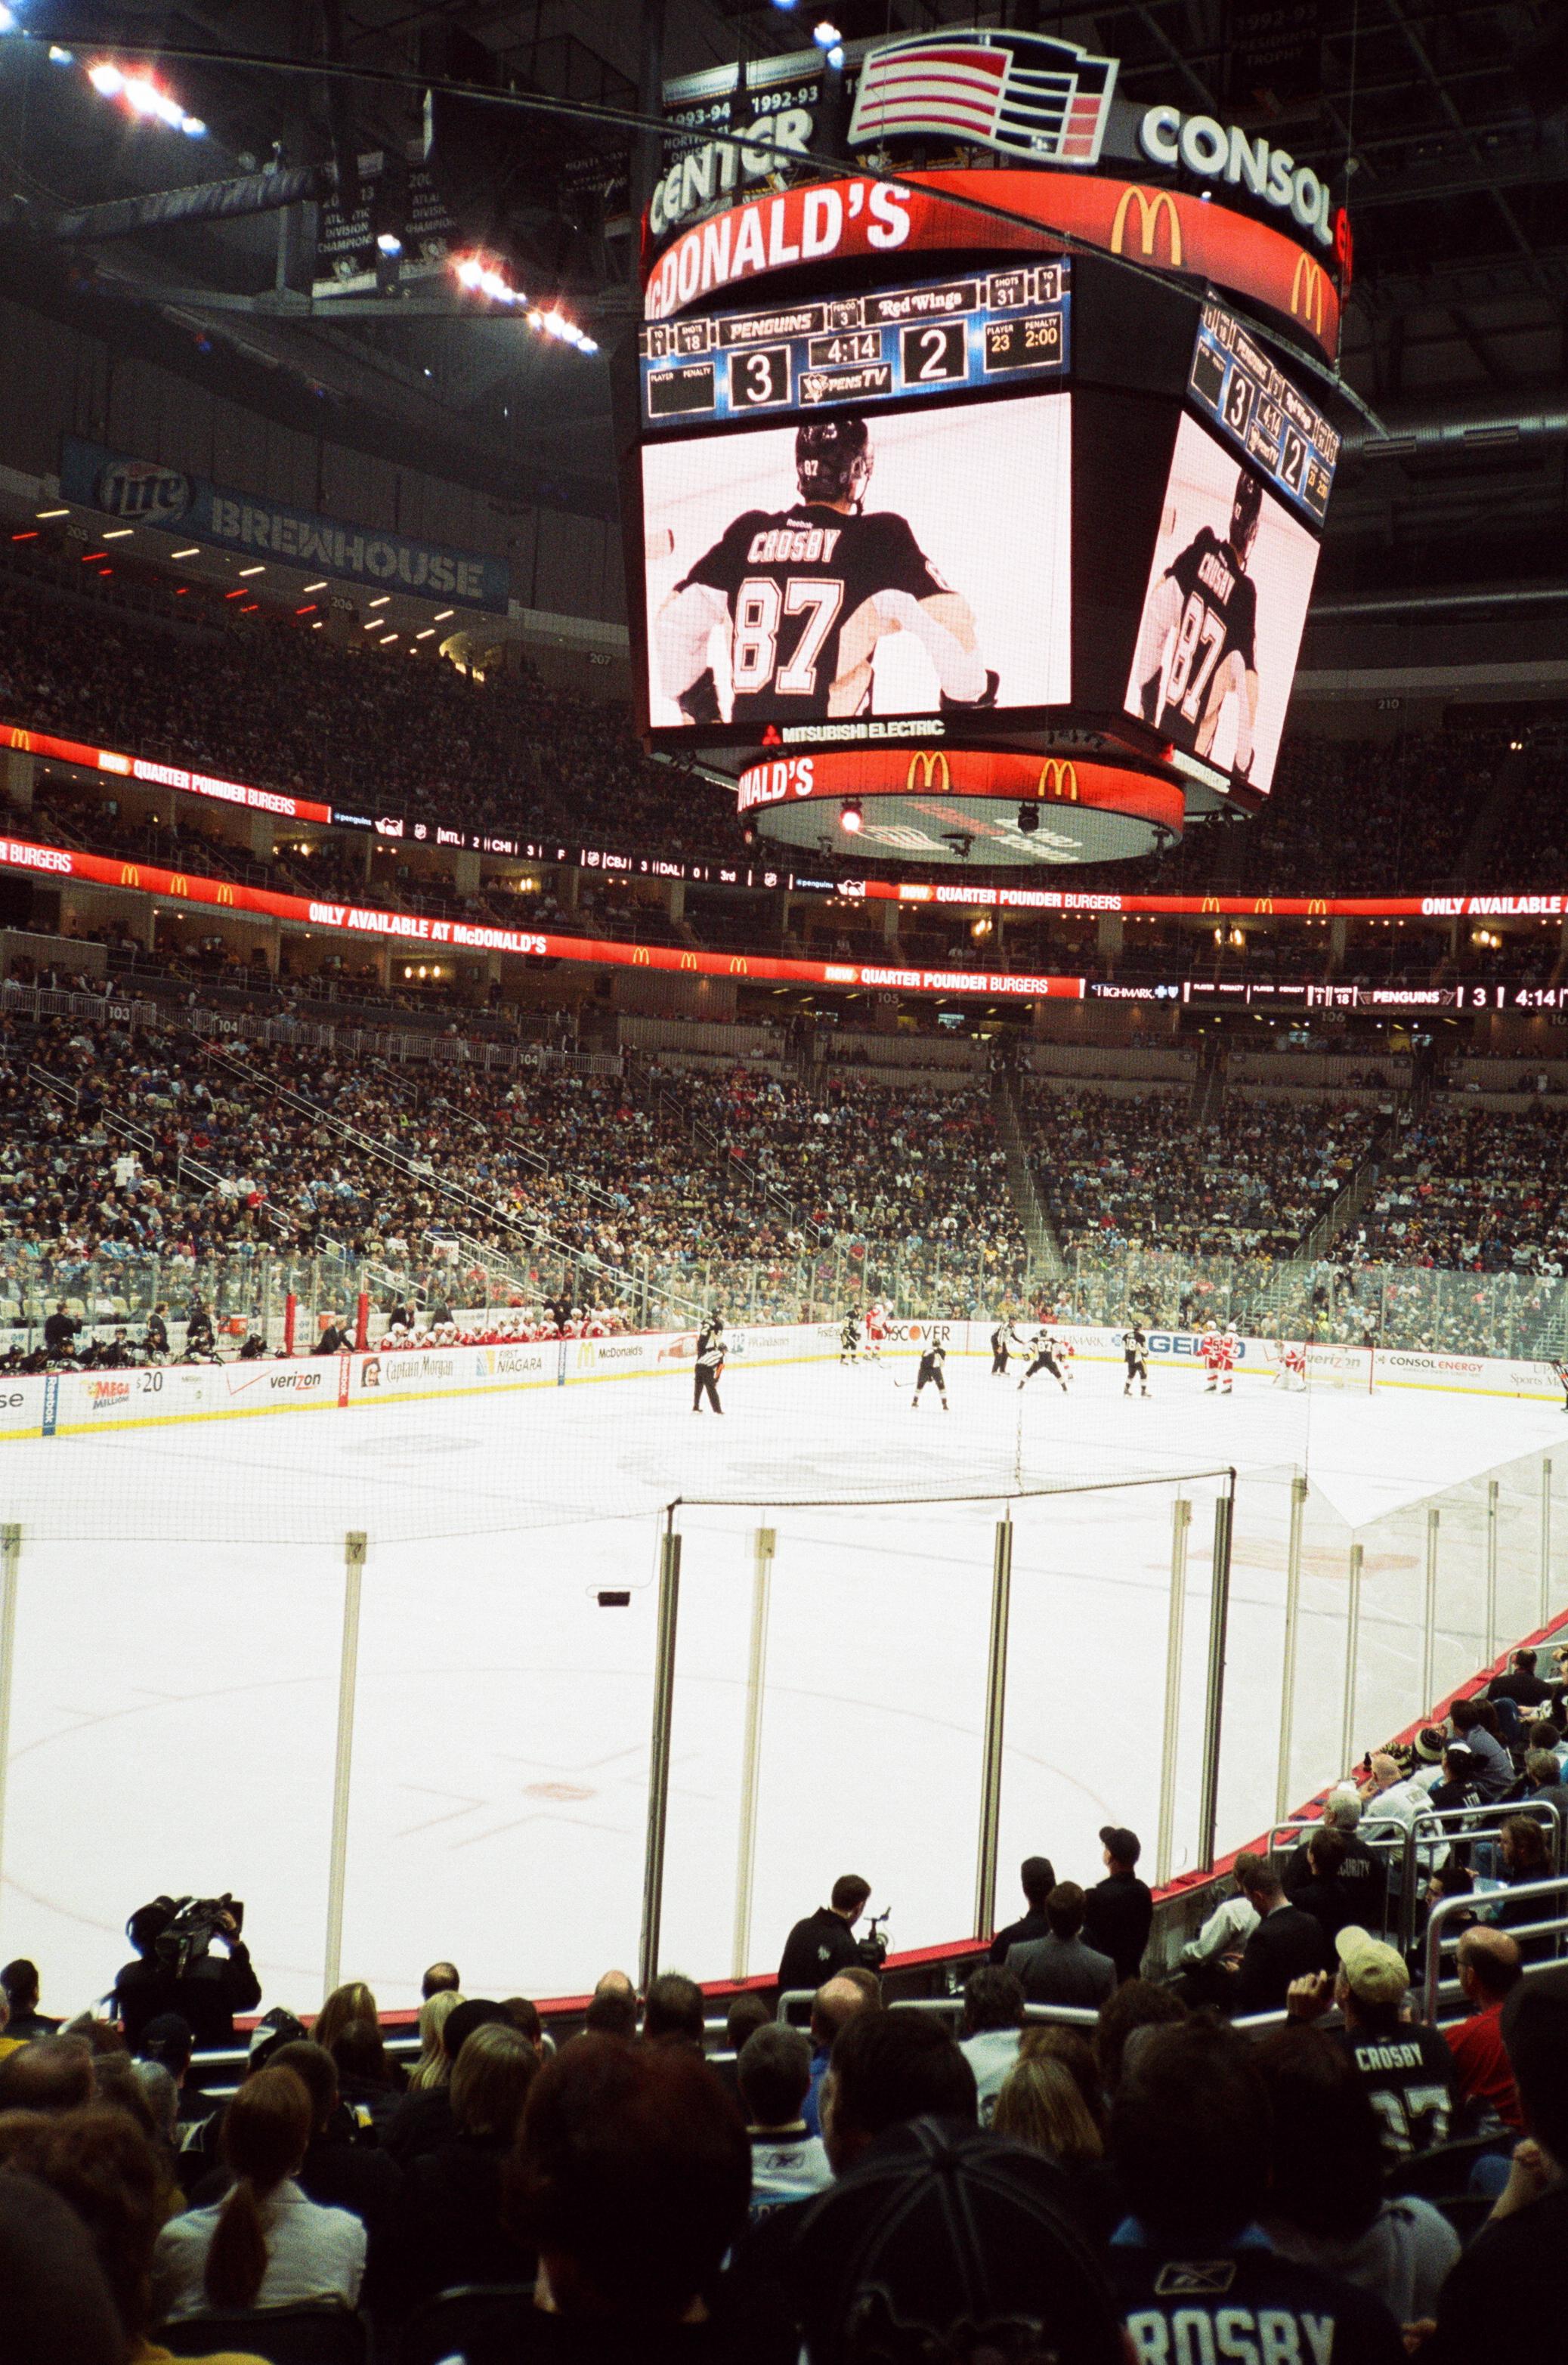 Hockey-Night-In-Pittsburgh-Film-Photography-Karlsson-054.jpg